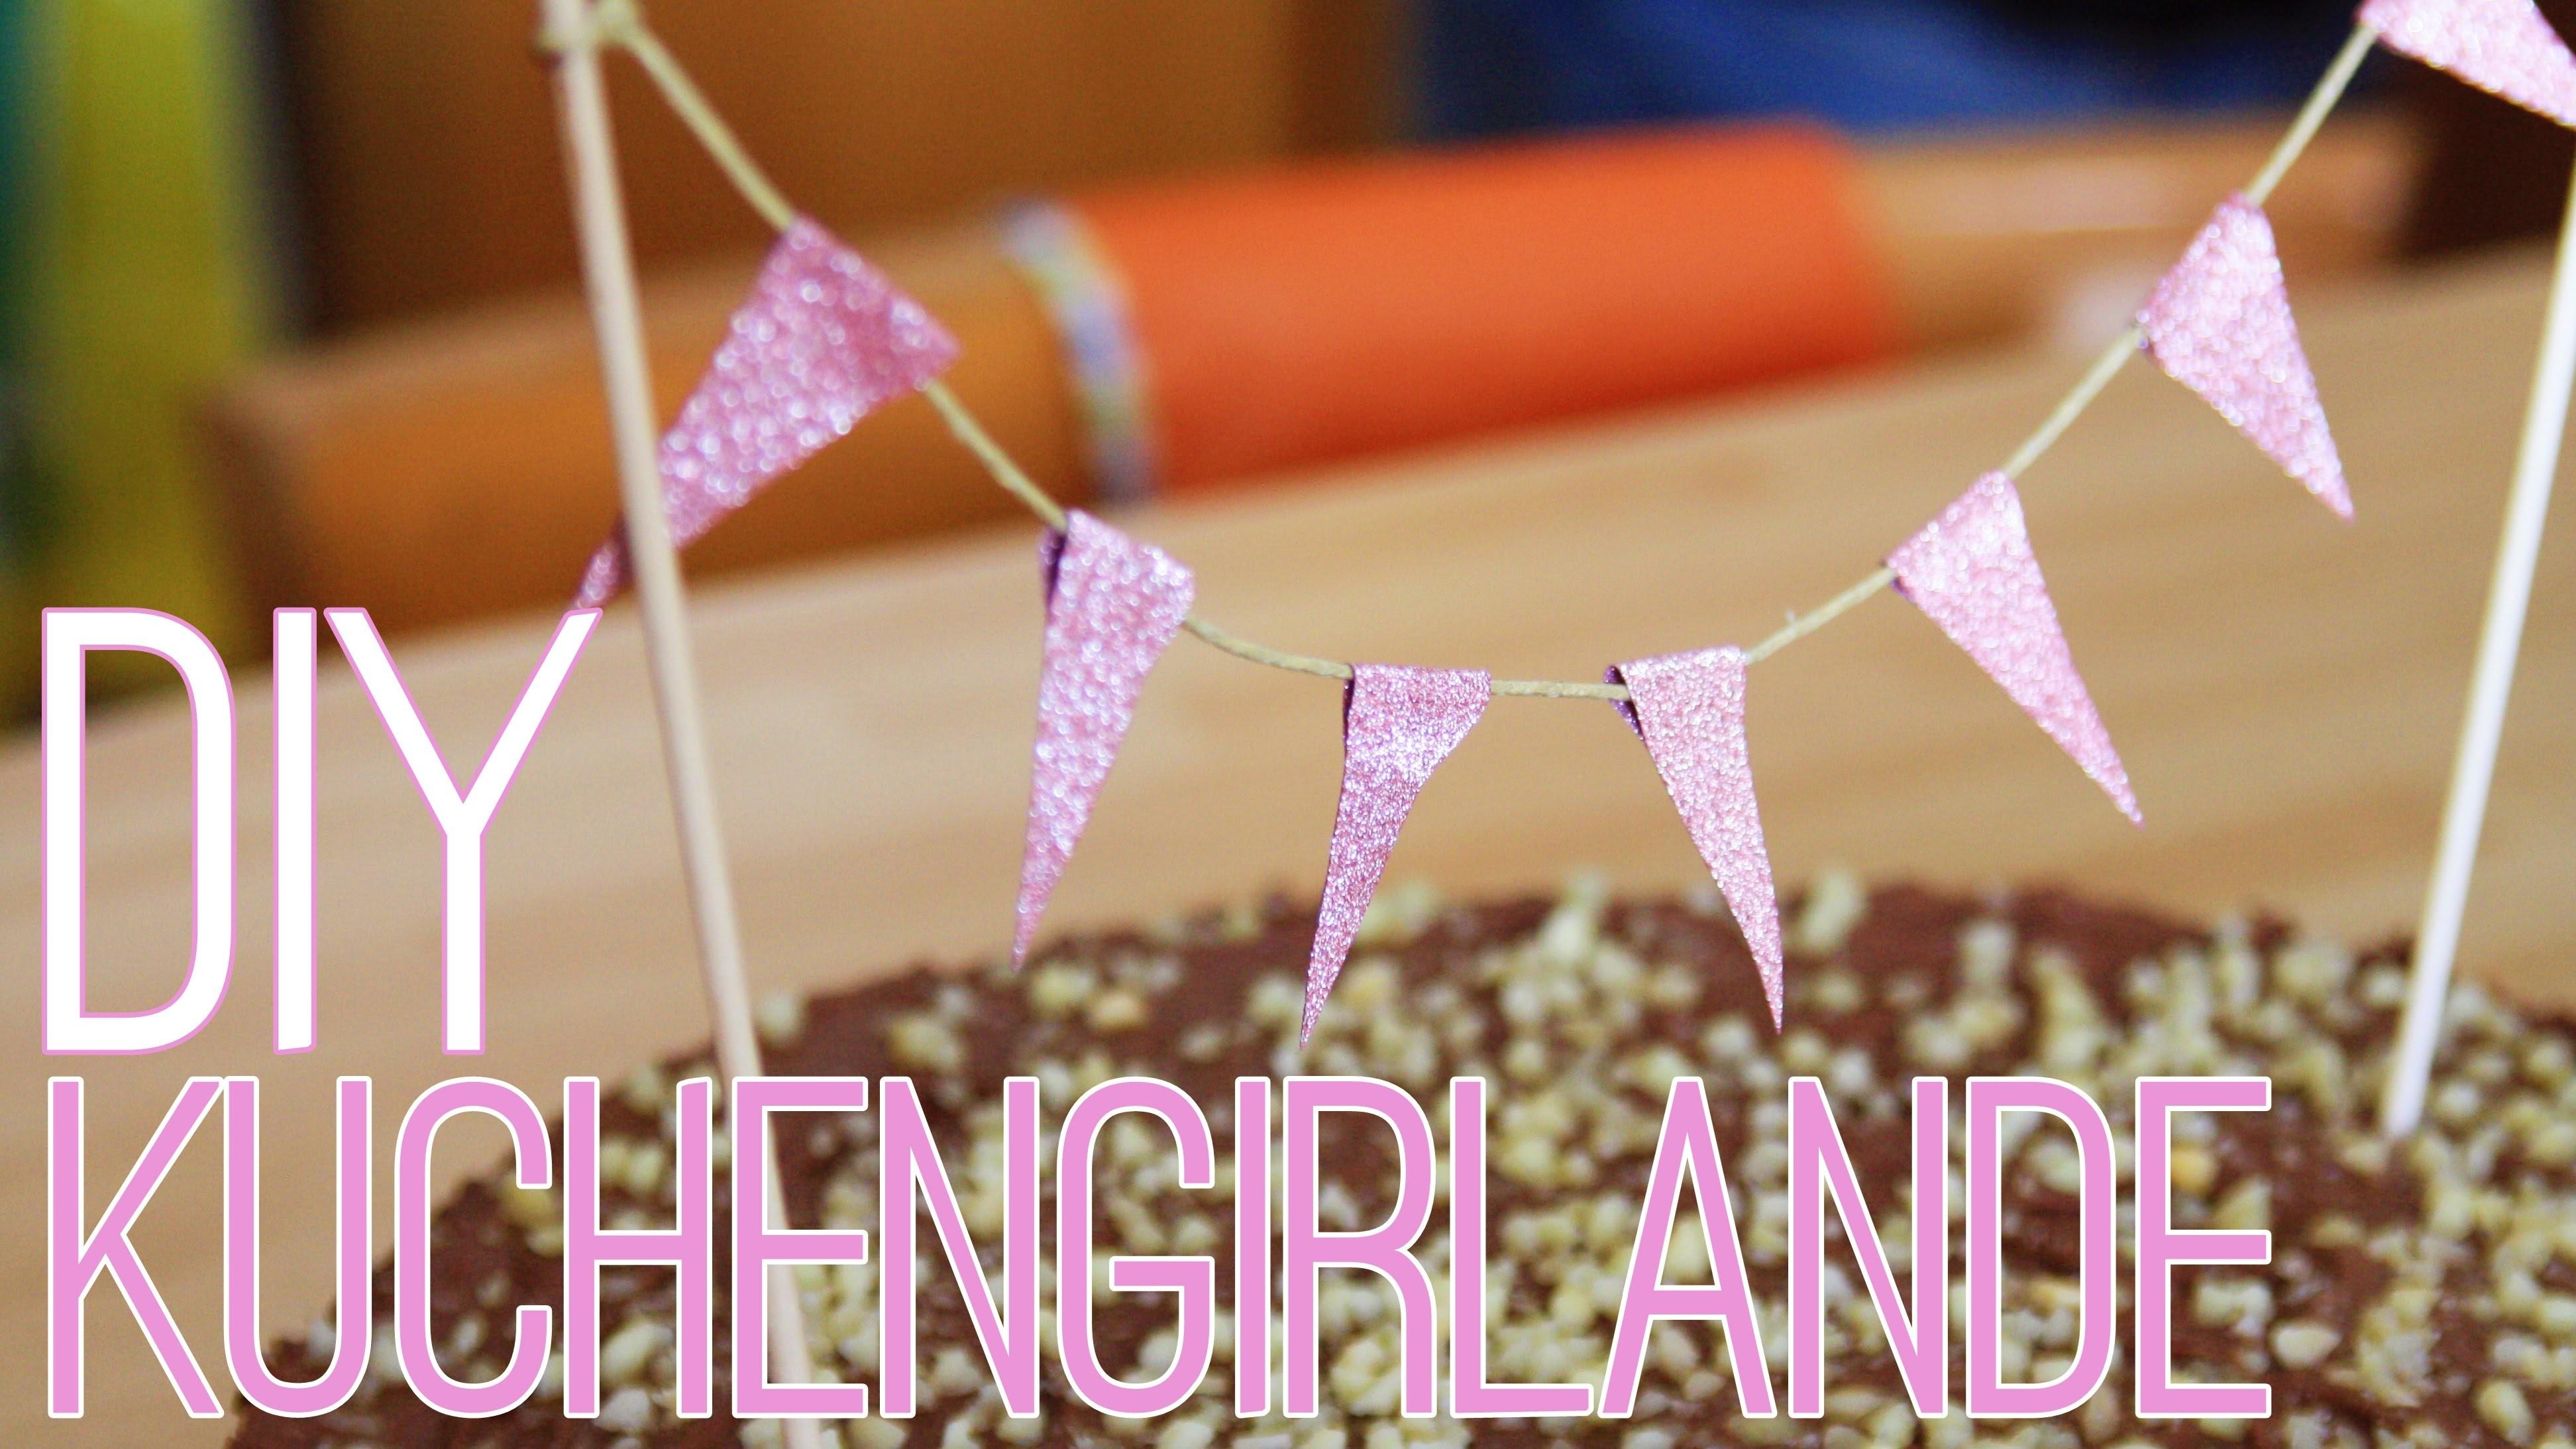 DIY #3 - KUCHENGIRLANDE | DECORATE YOUR CAKE